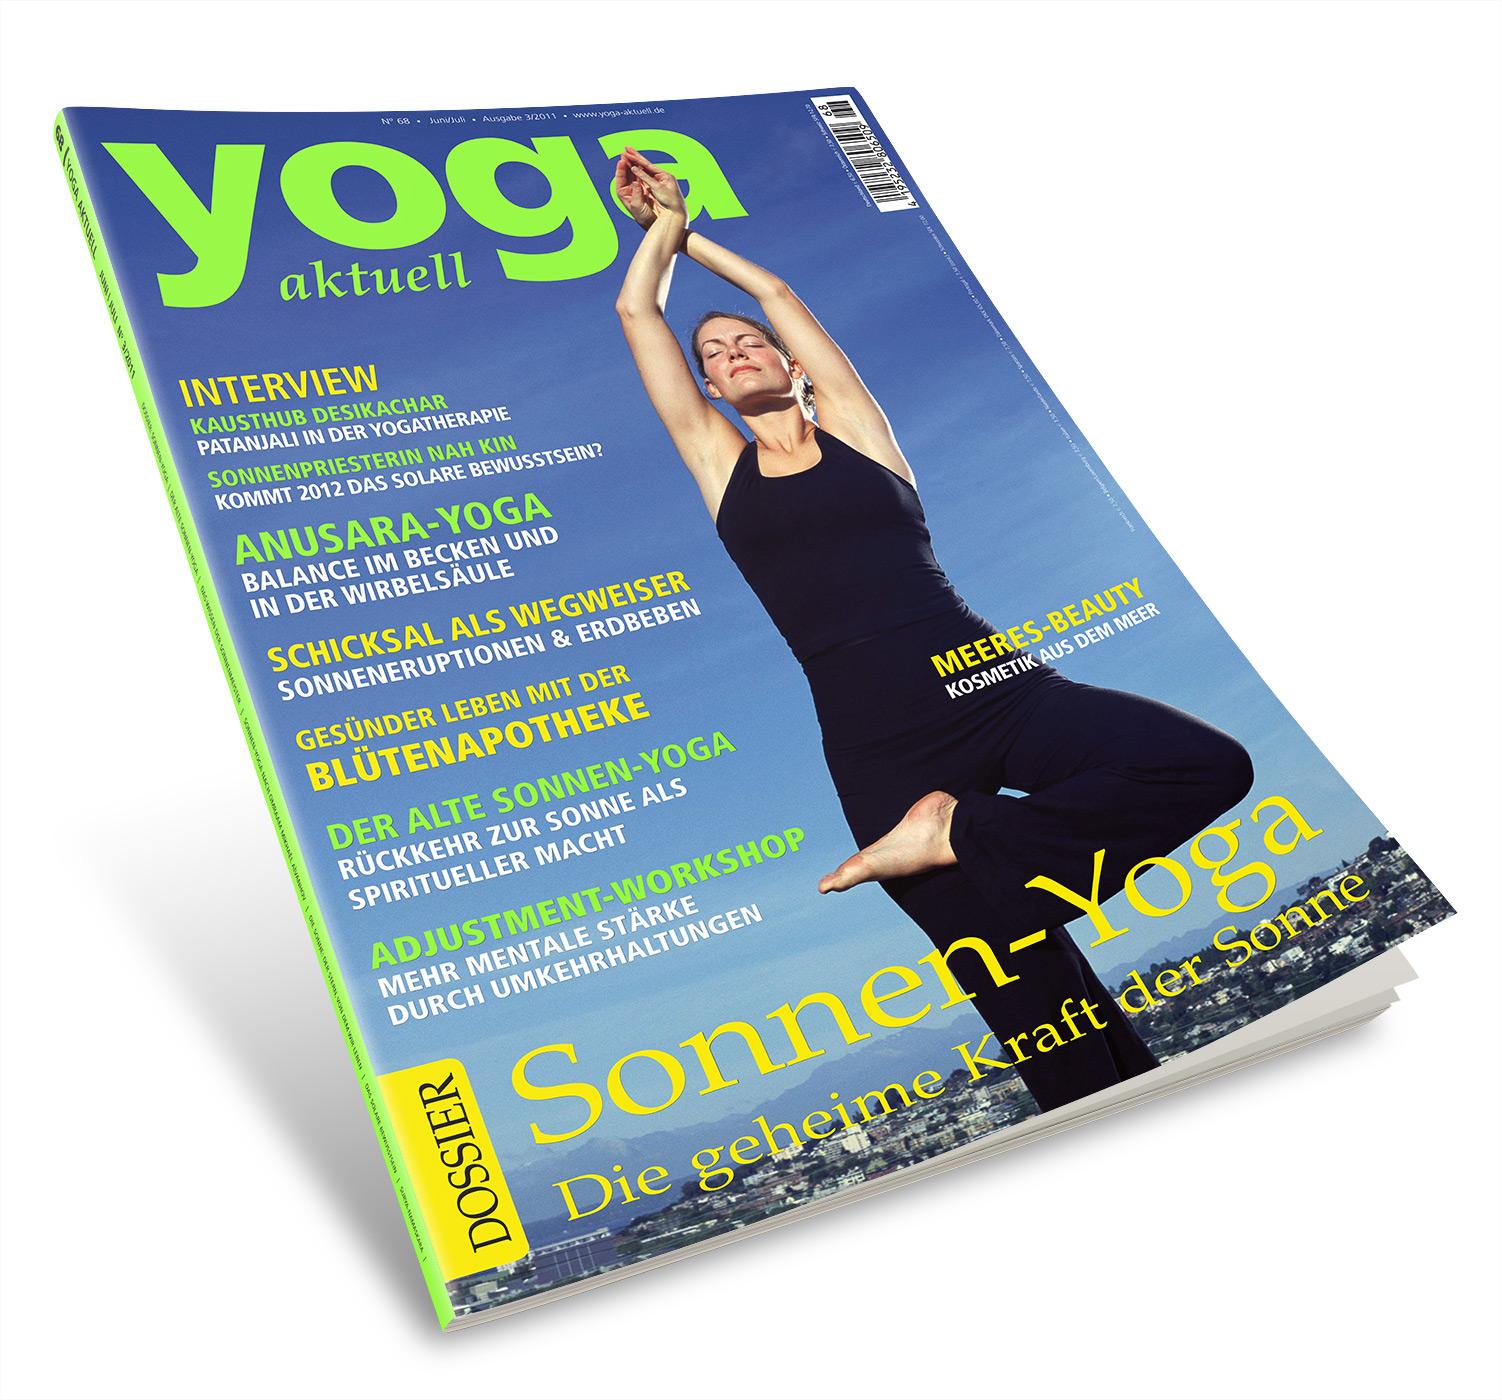 Yoga Aktuell 68 - 03/2011